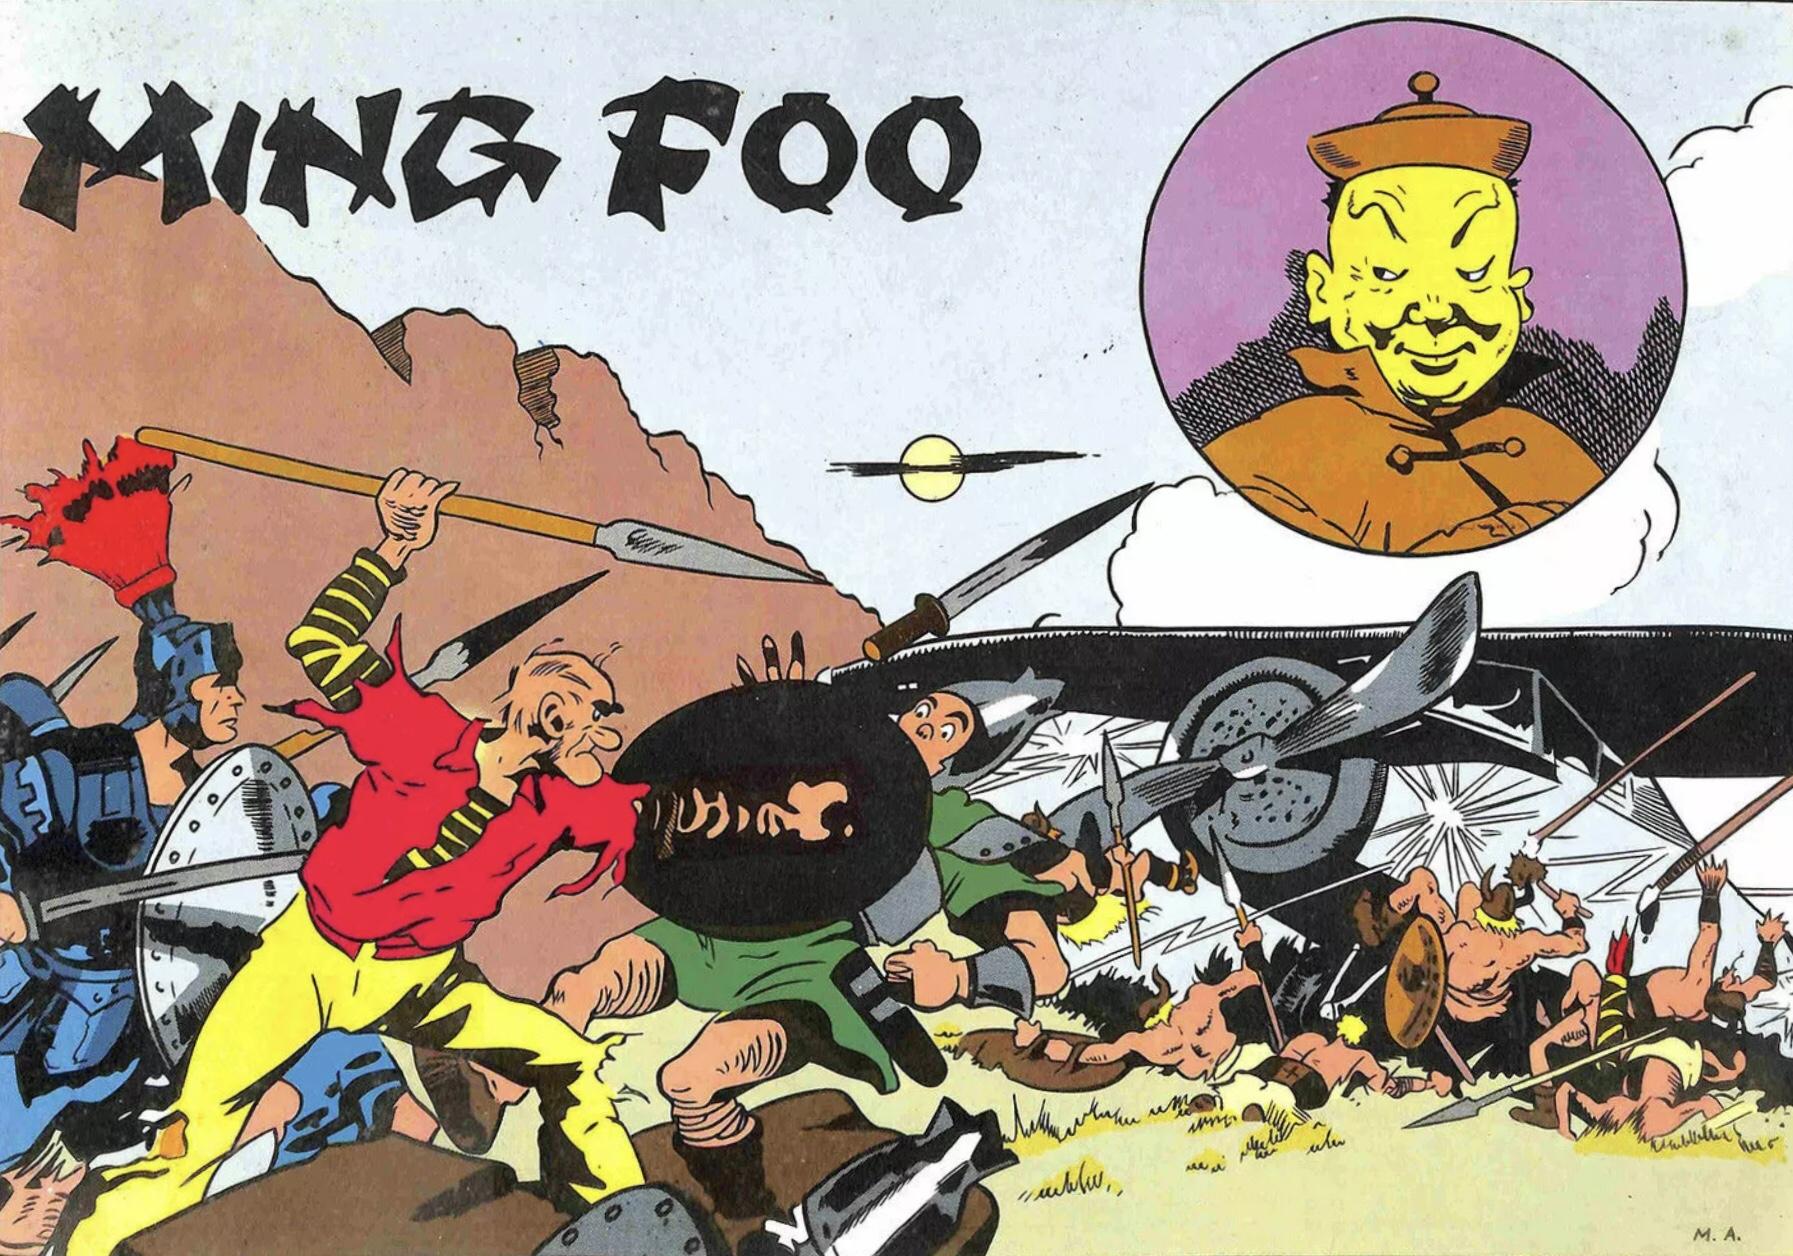 Ming Foo